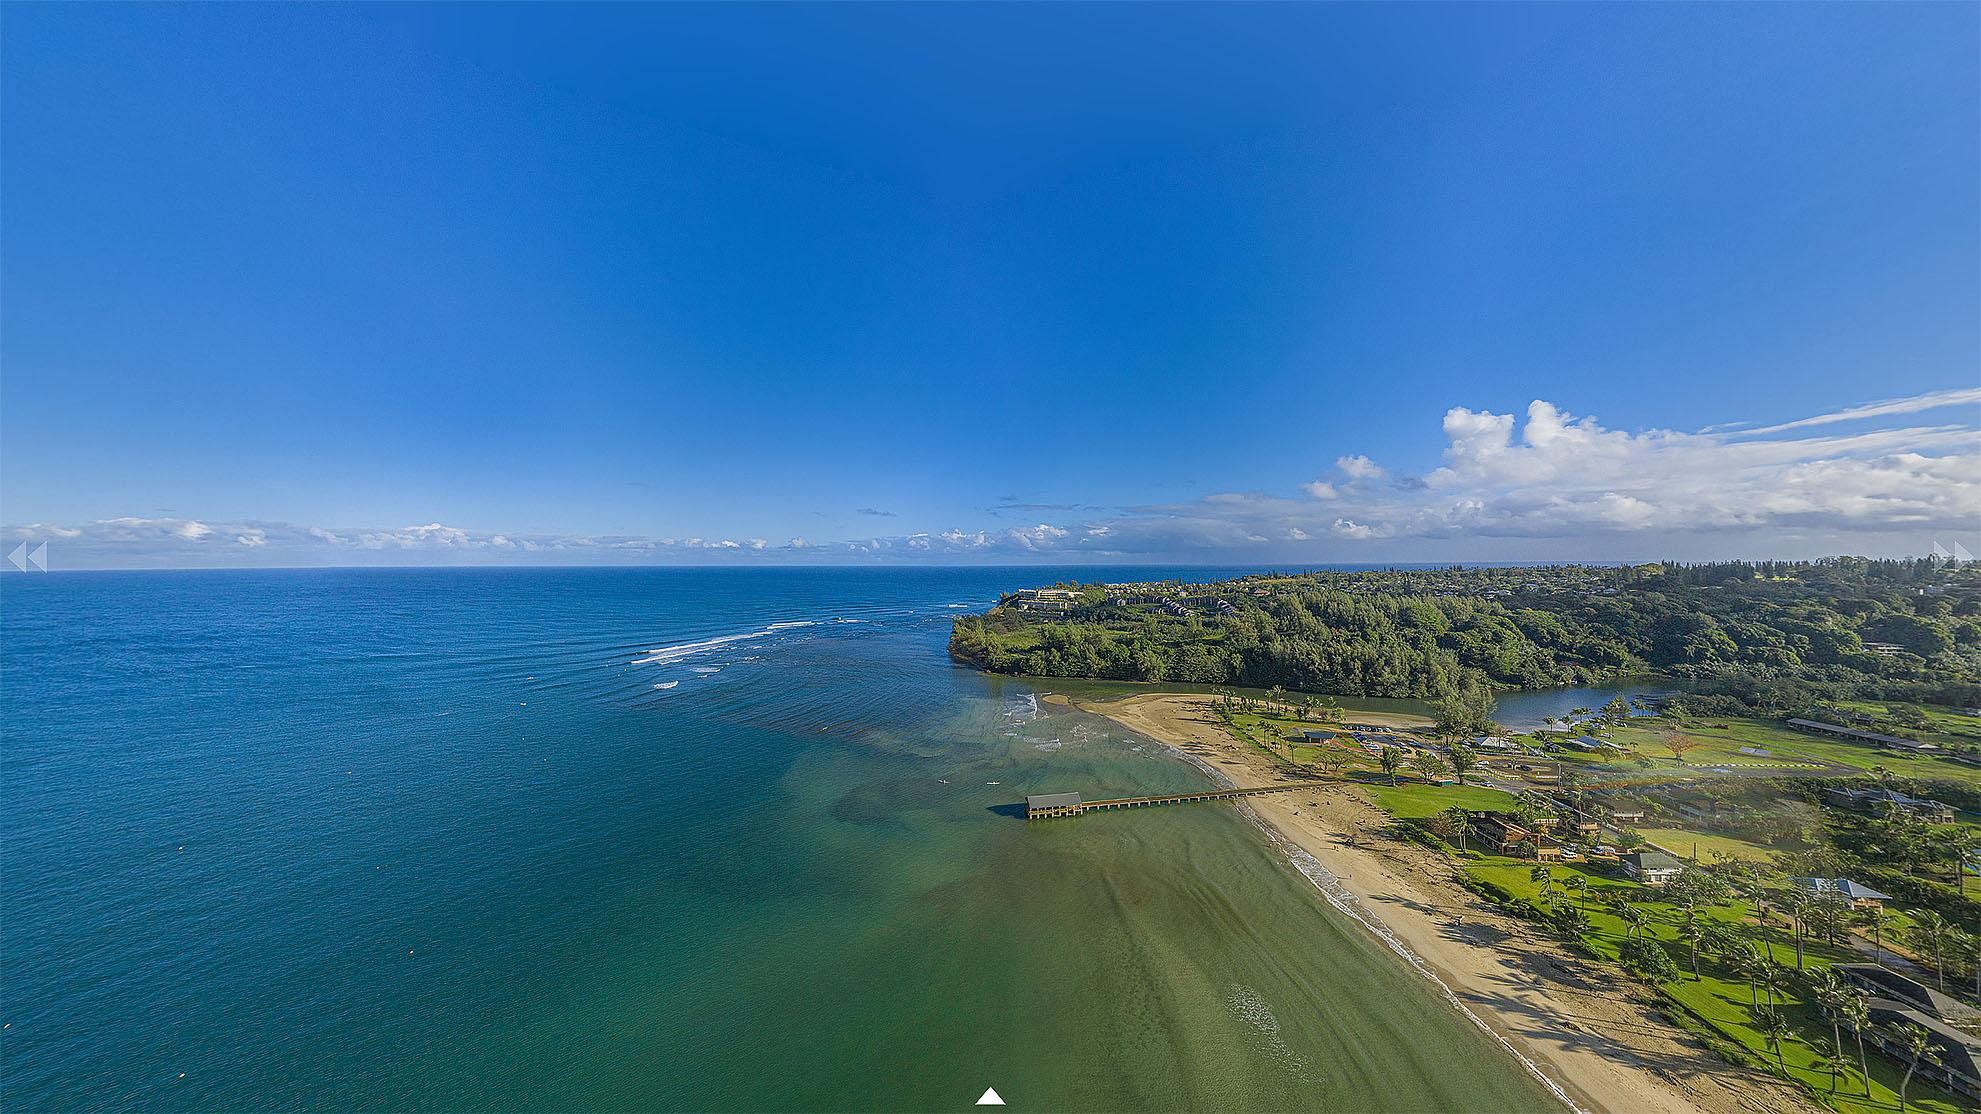 Hanalei Bay Panorama by PanaViz